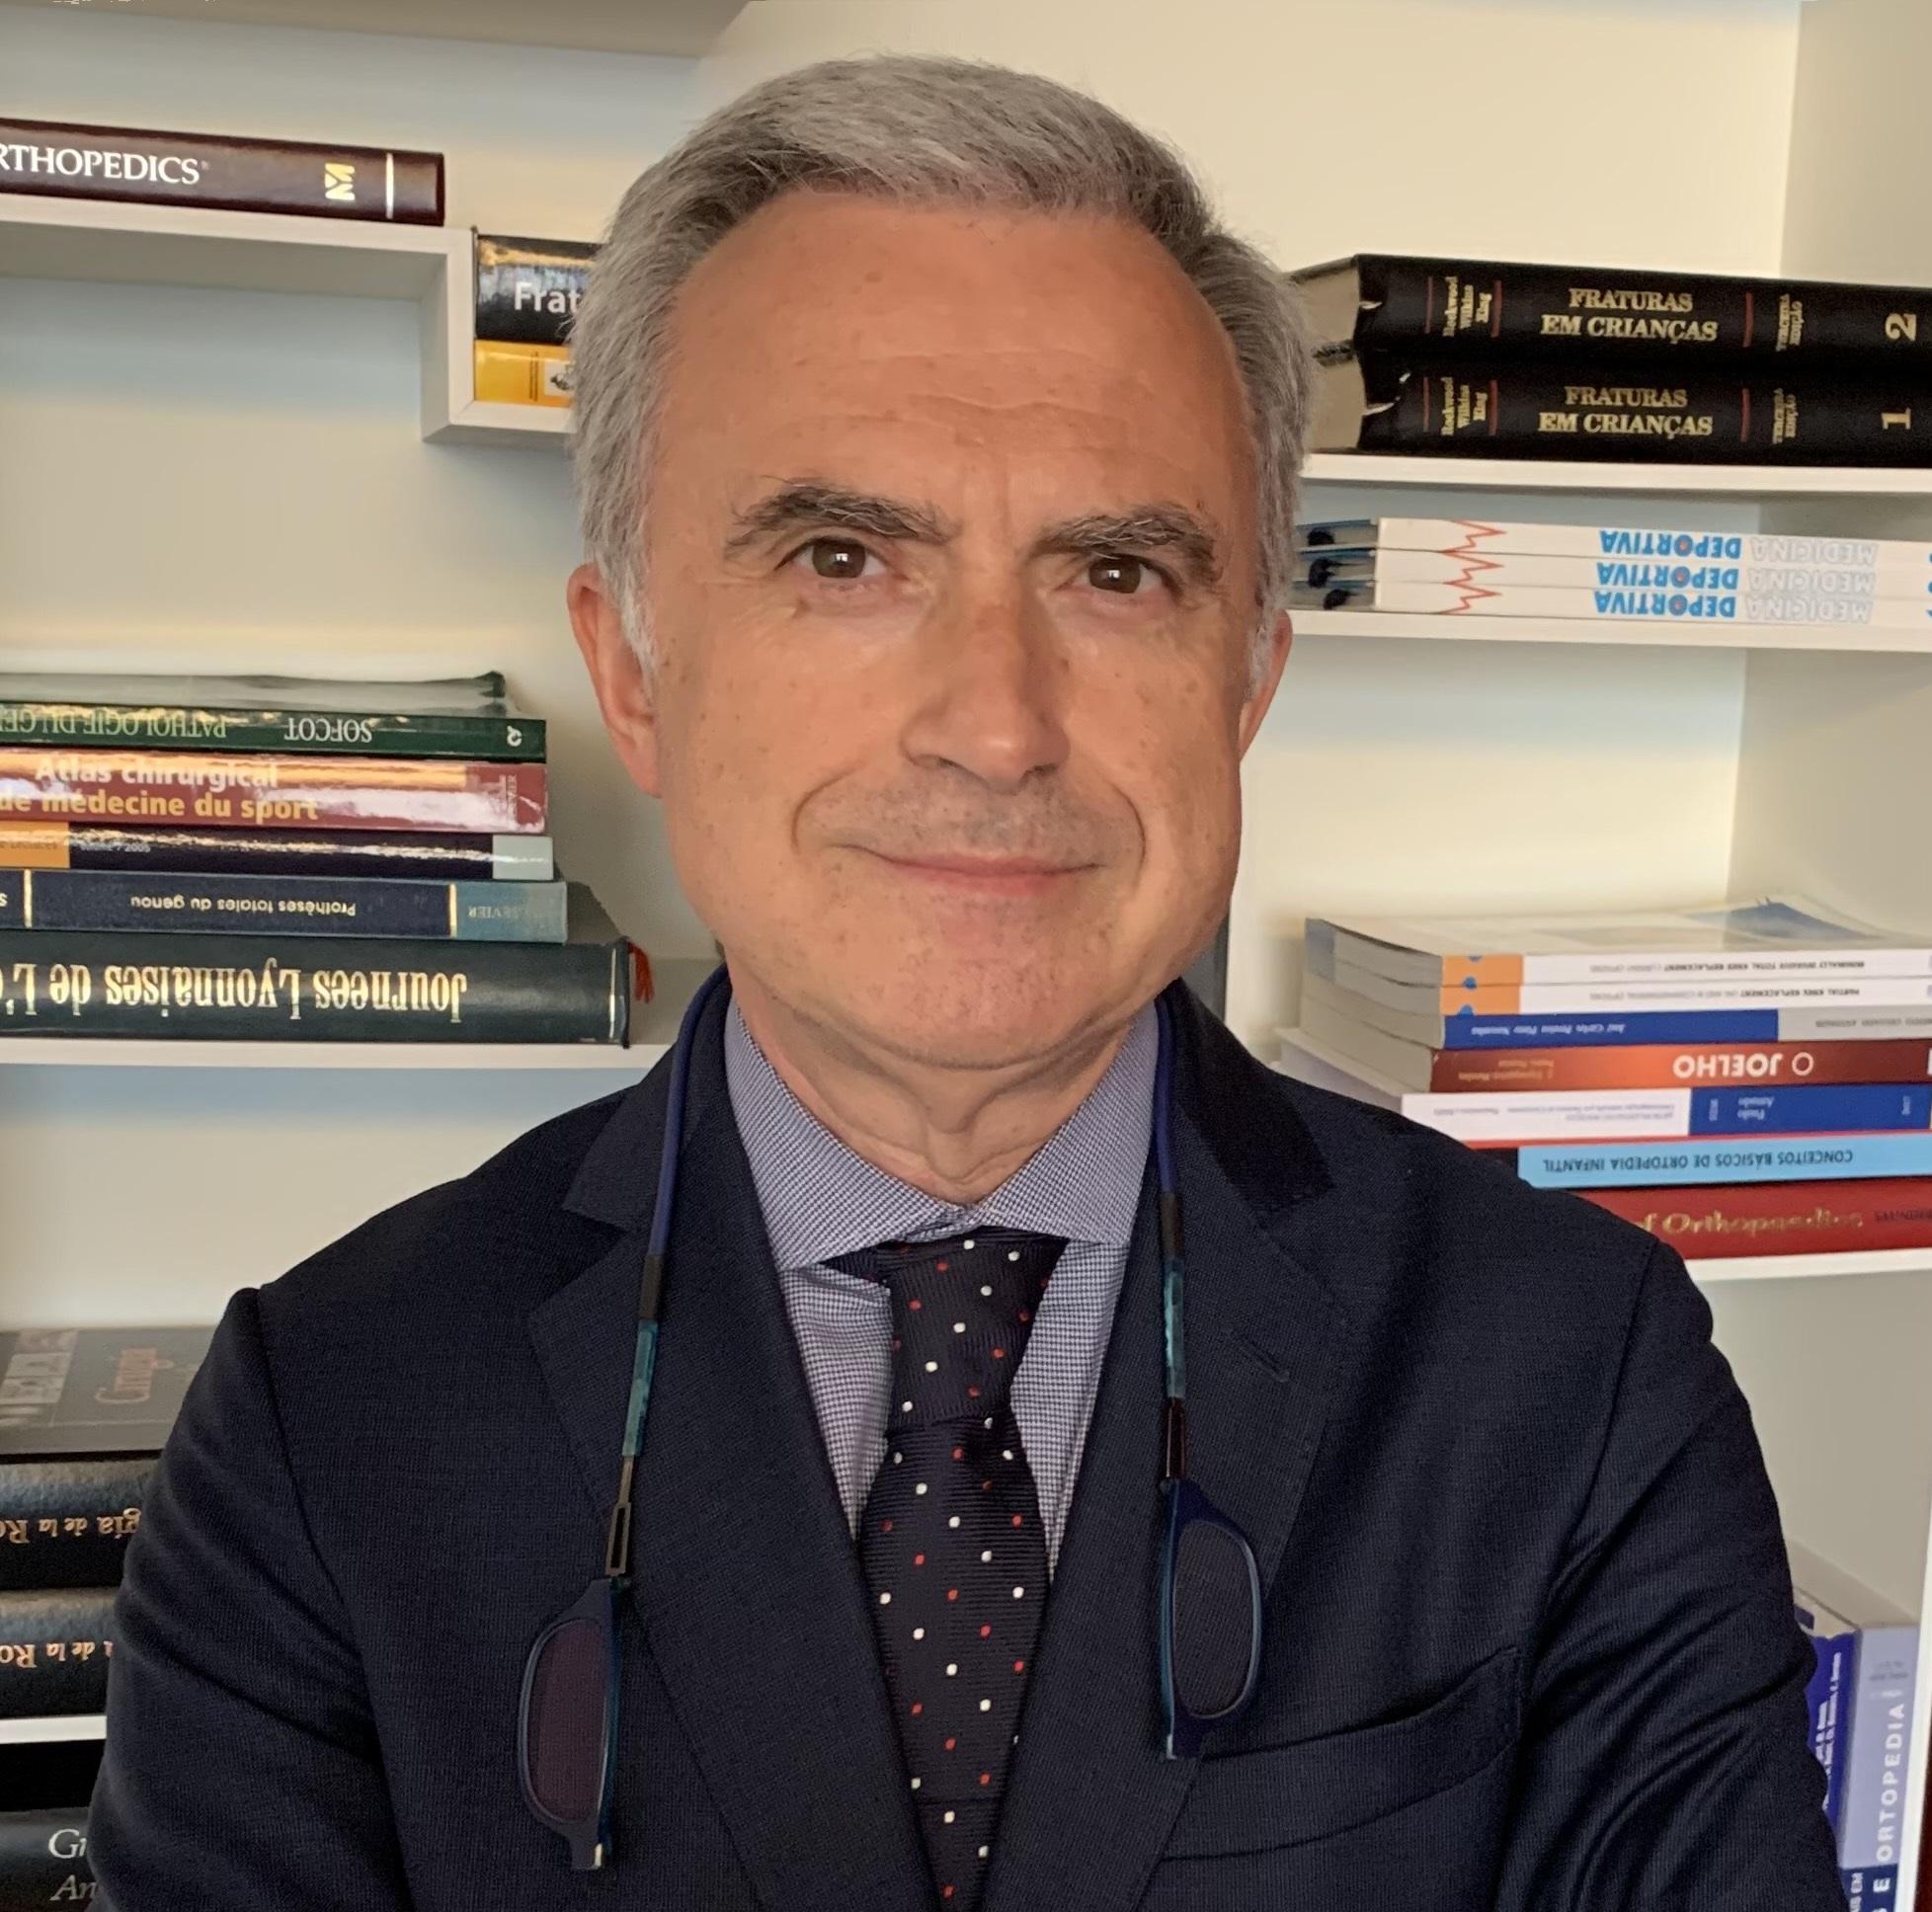 Alberto Monteiro